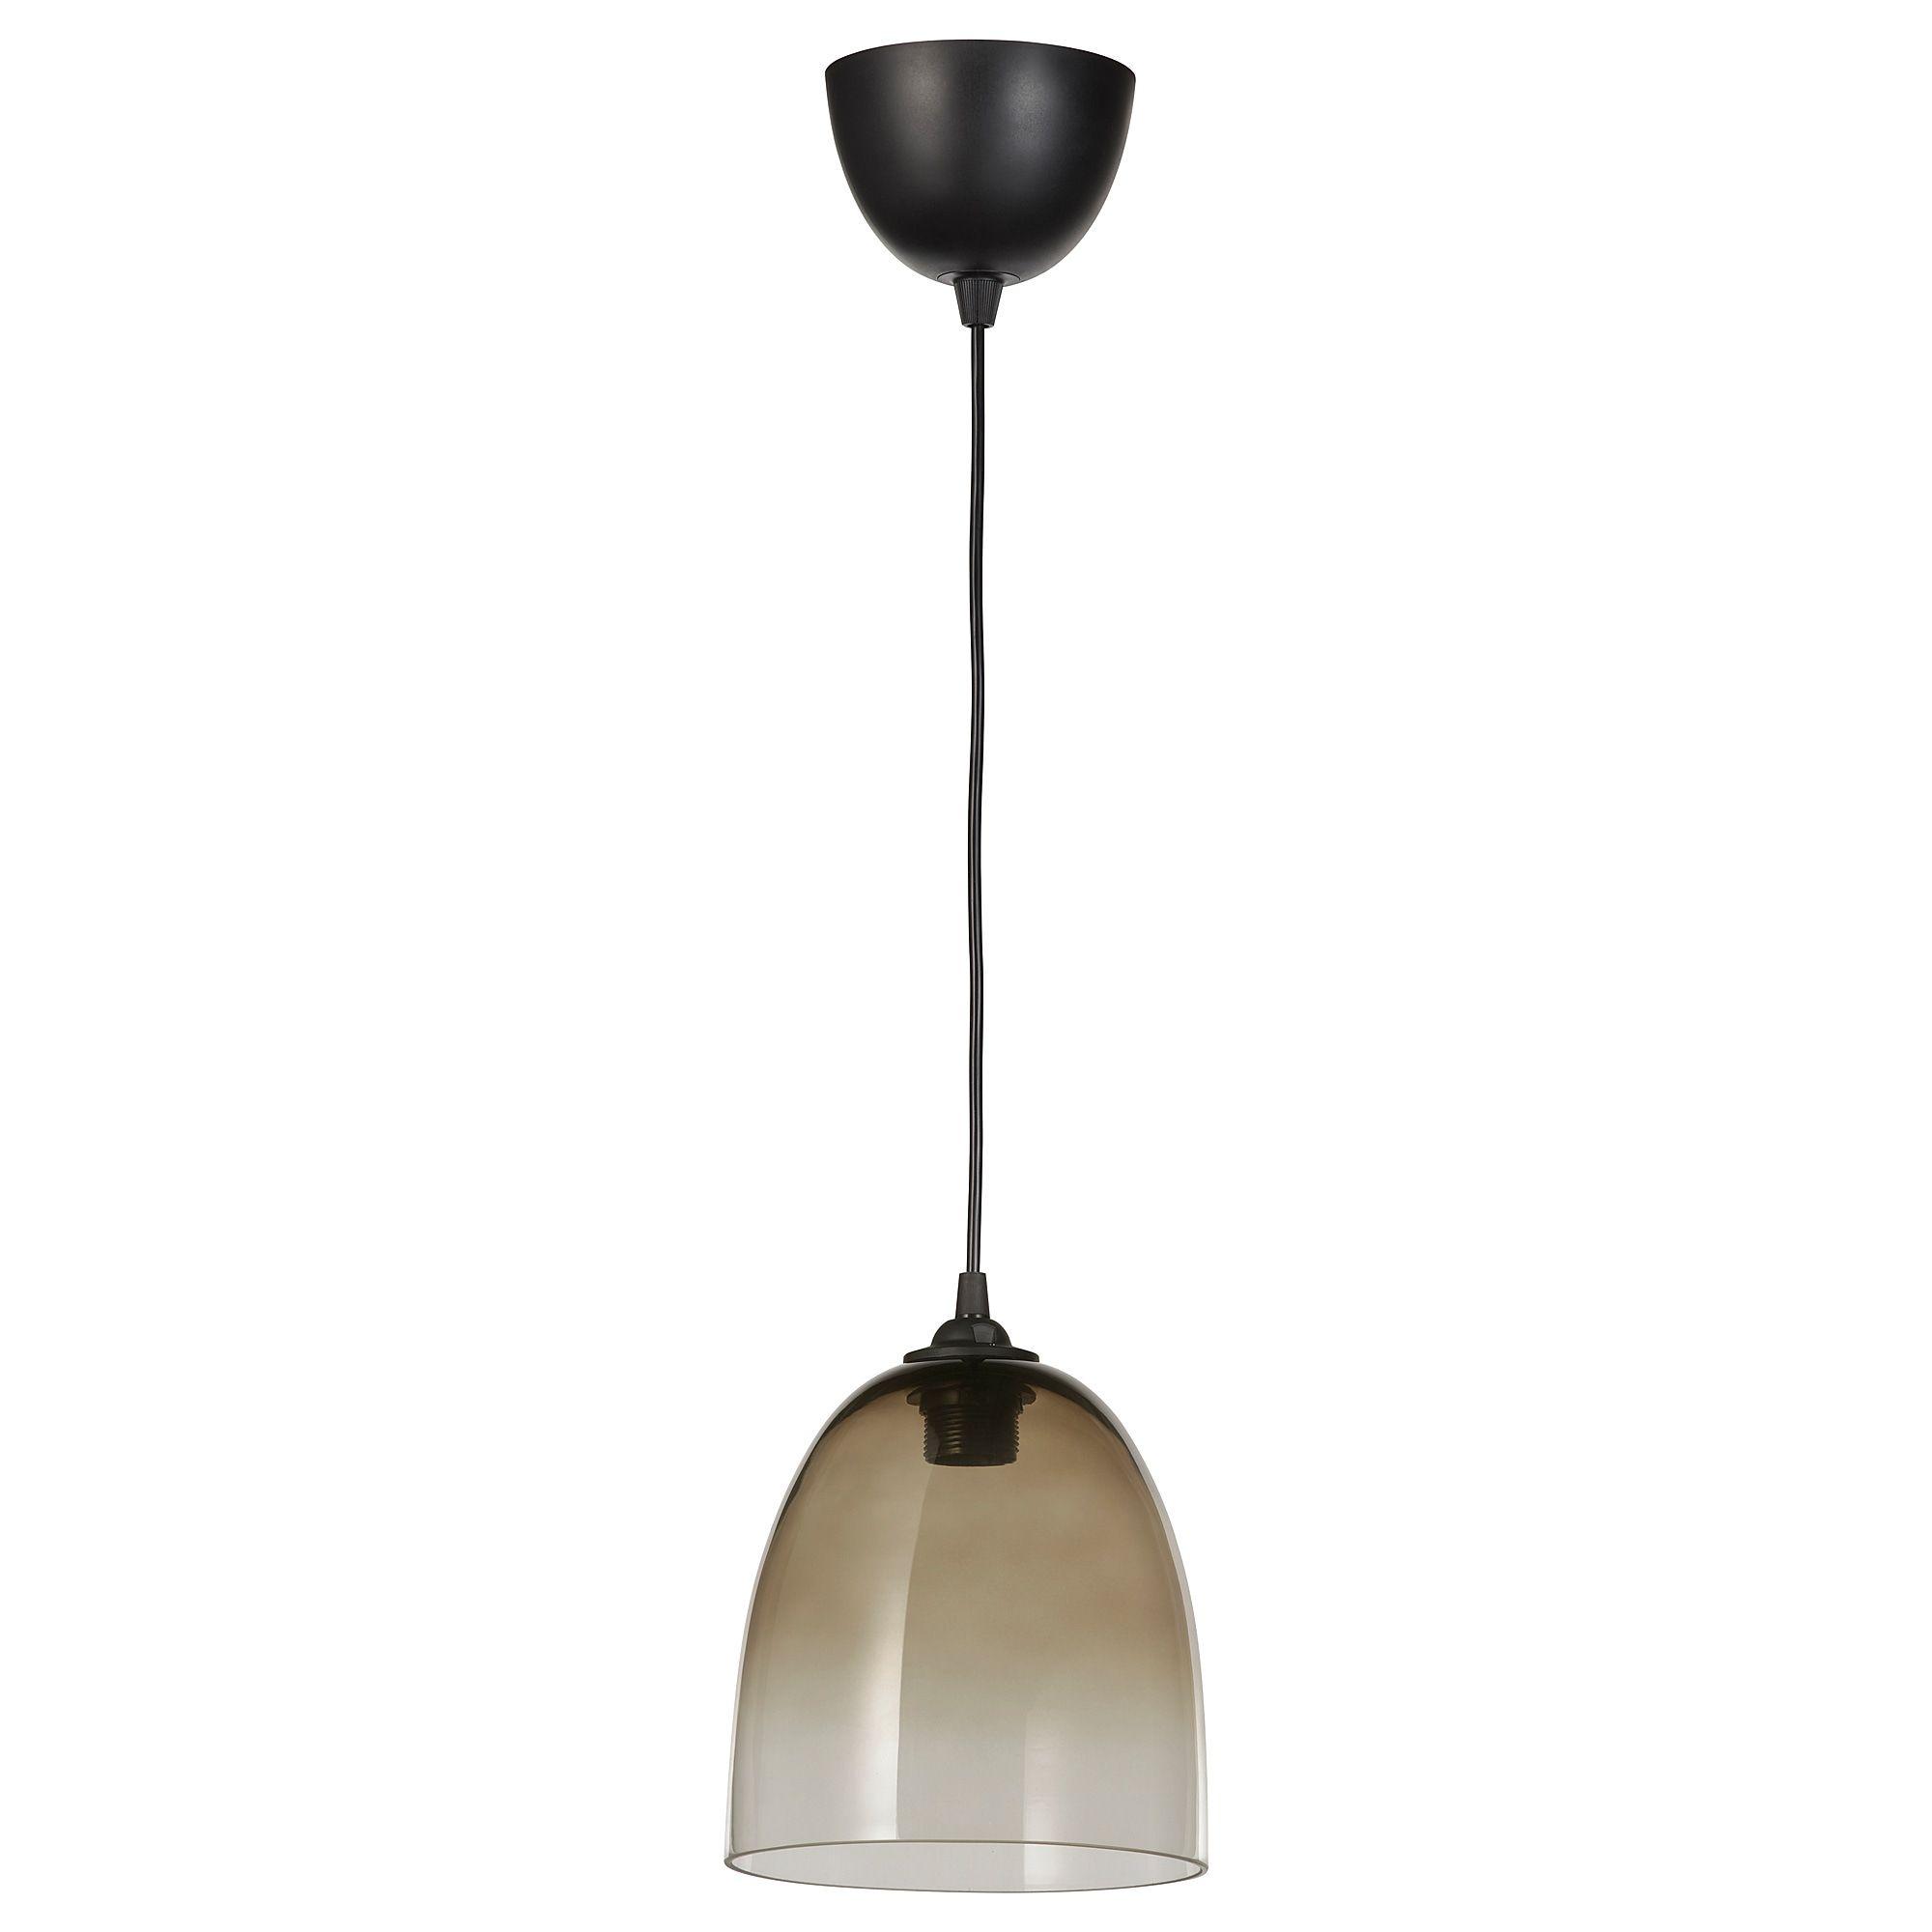 KLOCKRIKE glass, Pendant lamp shade, 20